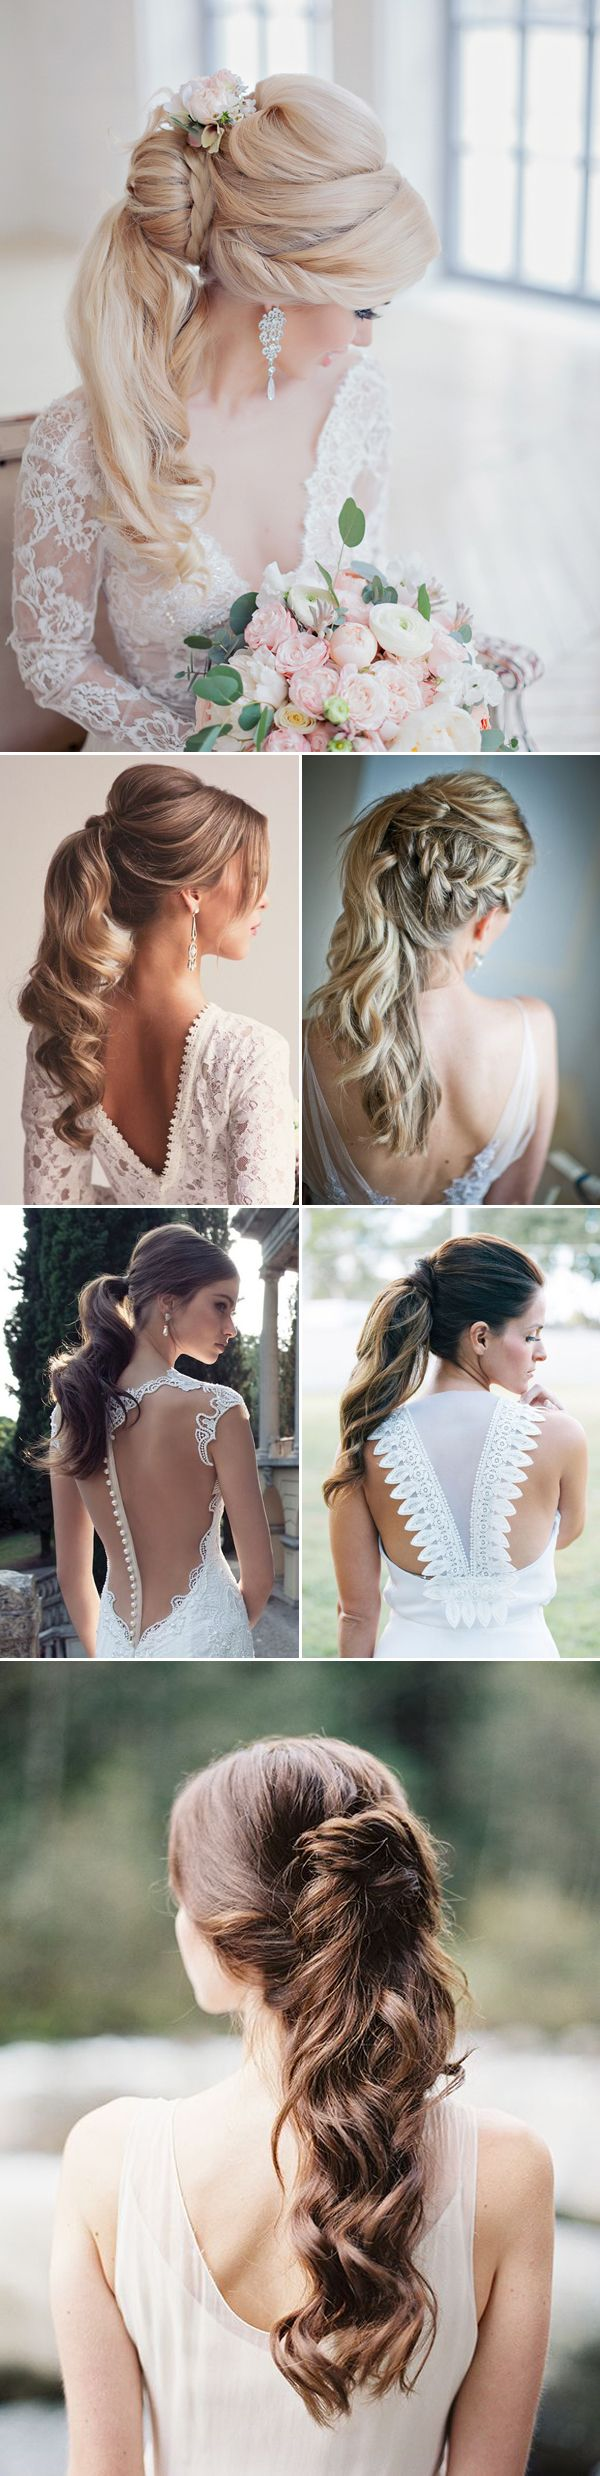 30 Seriously Hairstyles for Weddings (with Tutorial) | www.deerpearlflow...